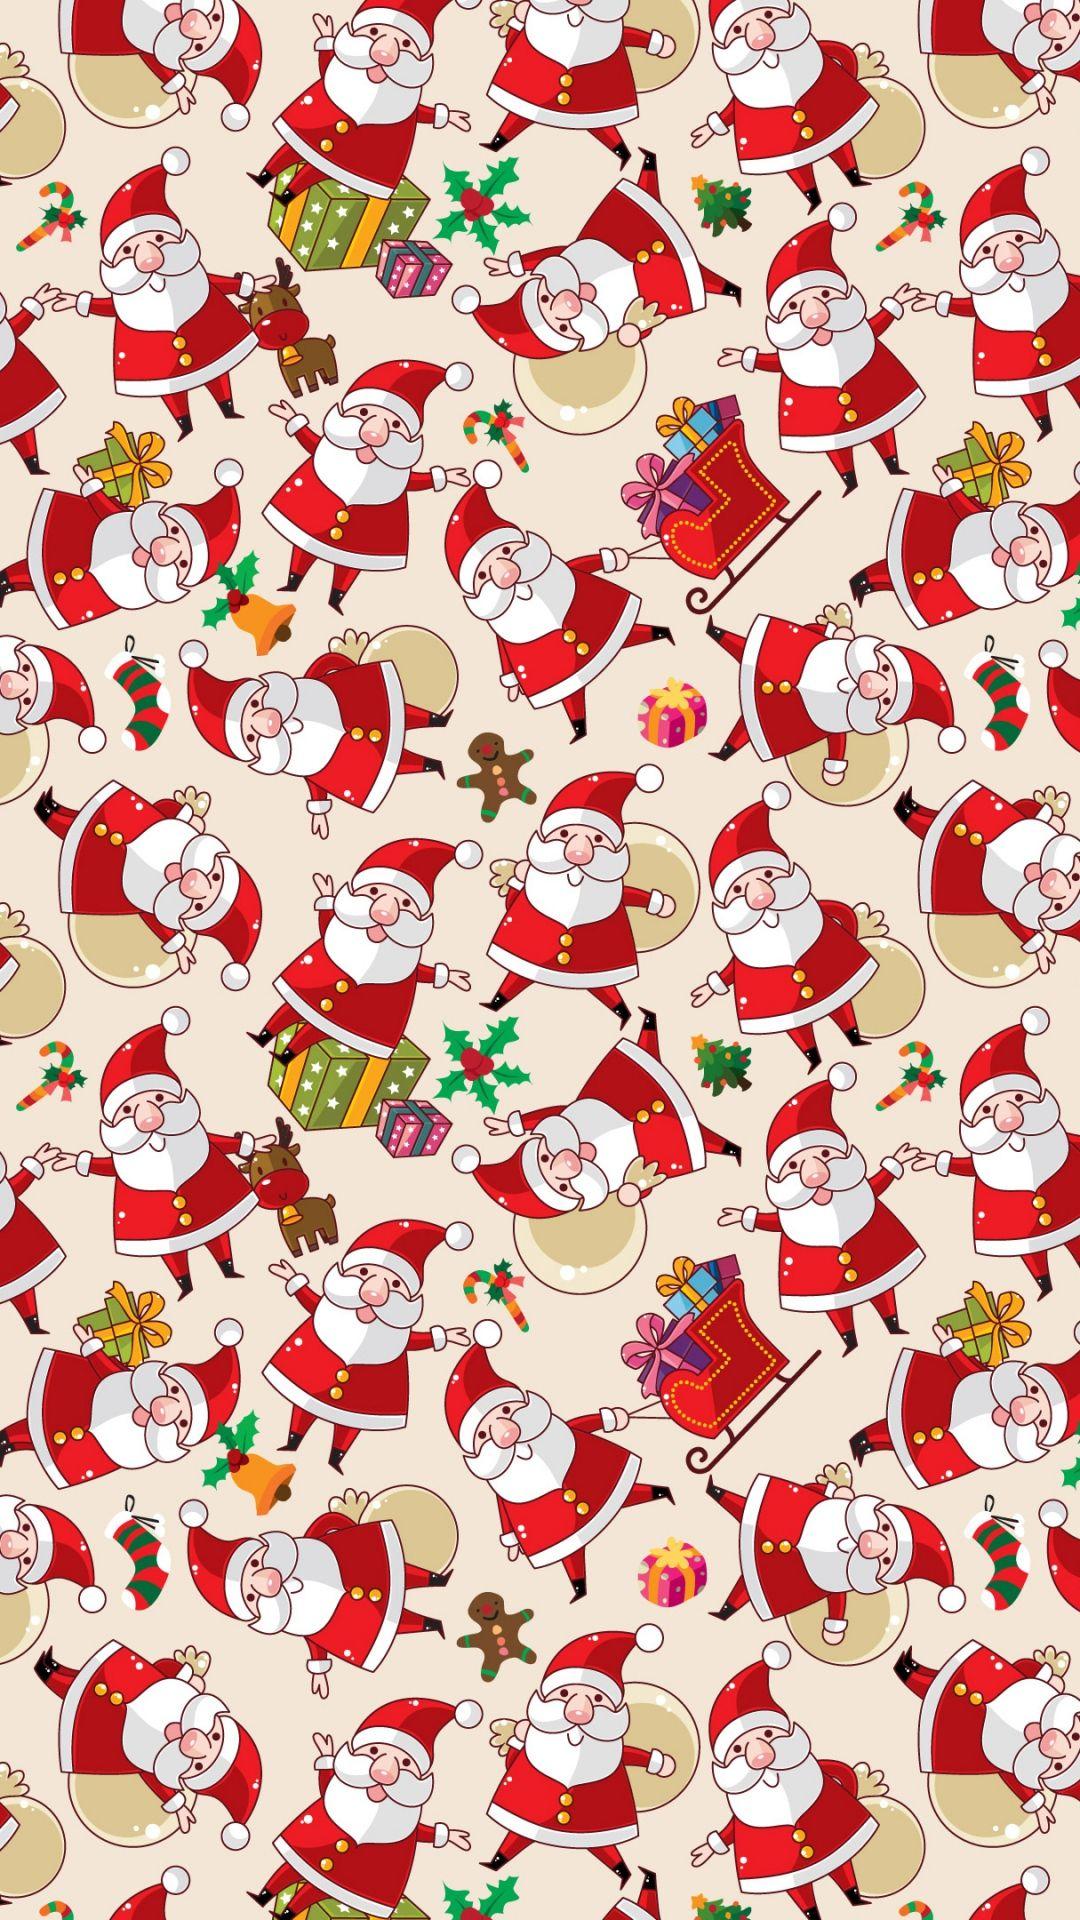 Sfondi Natalizi Iohone 6.Santa Claus Pattern Texture Background Iphone 6 Wallpaper Babbo